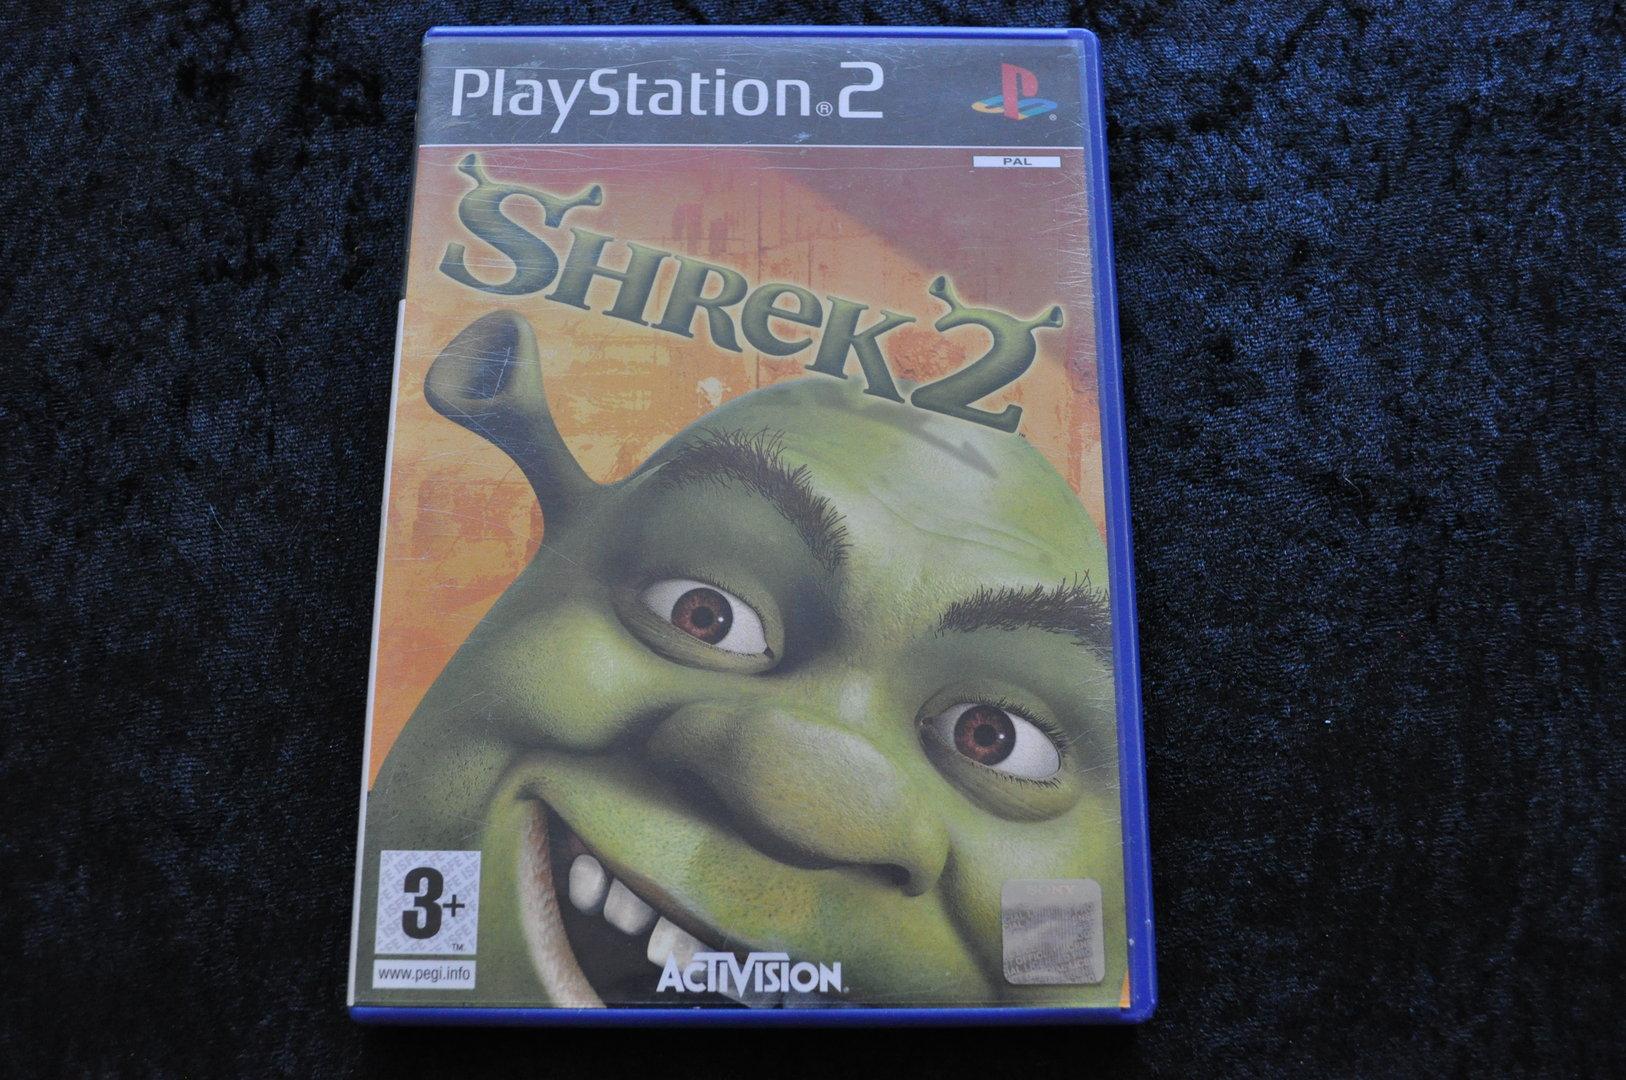 Shrek 2 Playstation 2 PS2 - Retrogameking.com |  Retro,Games,Consoles,Collectables